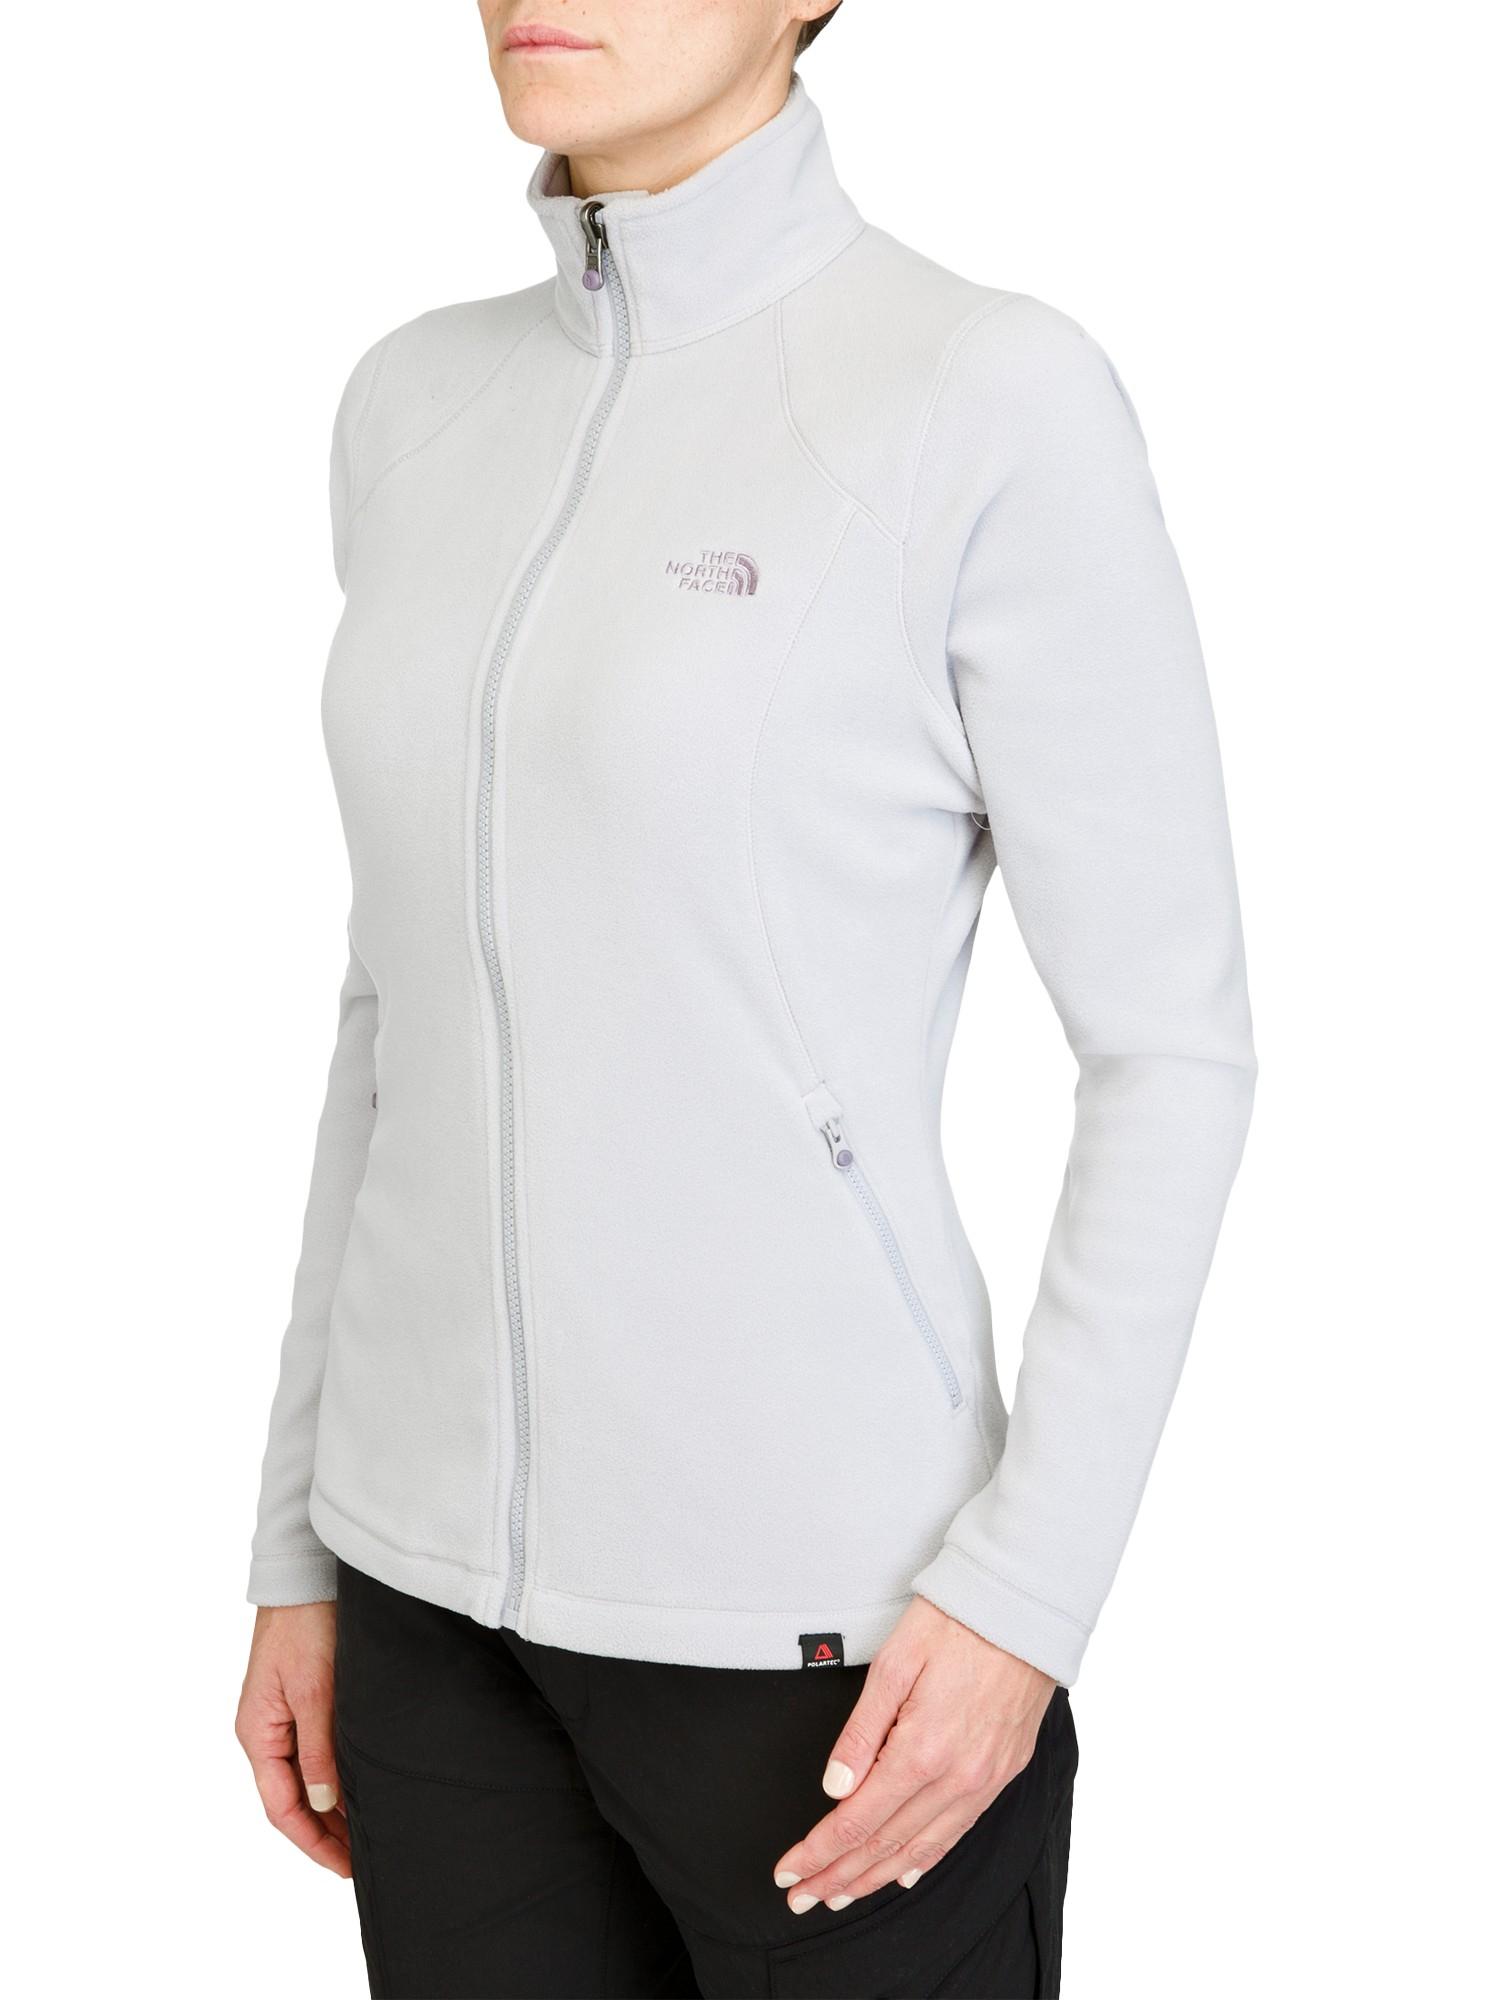 0f6f39372c7 The North Face Women S 100 Glacier Full Zip Fleece Jacket in Gray - Lyst